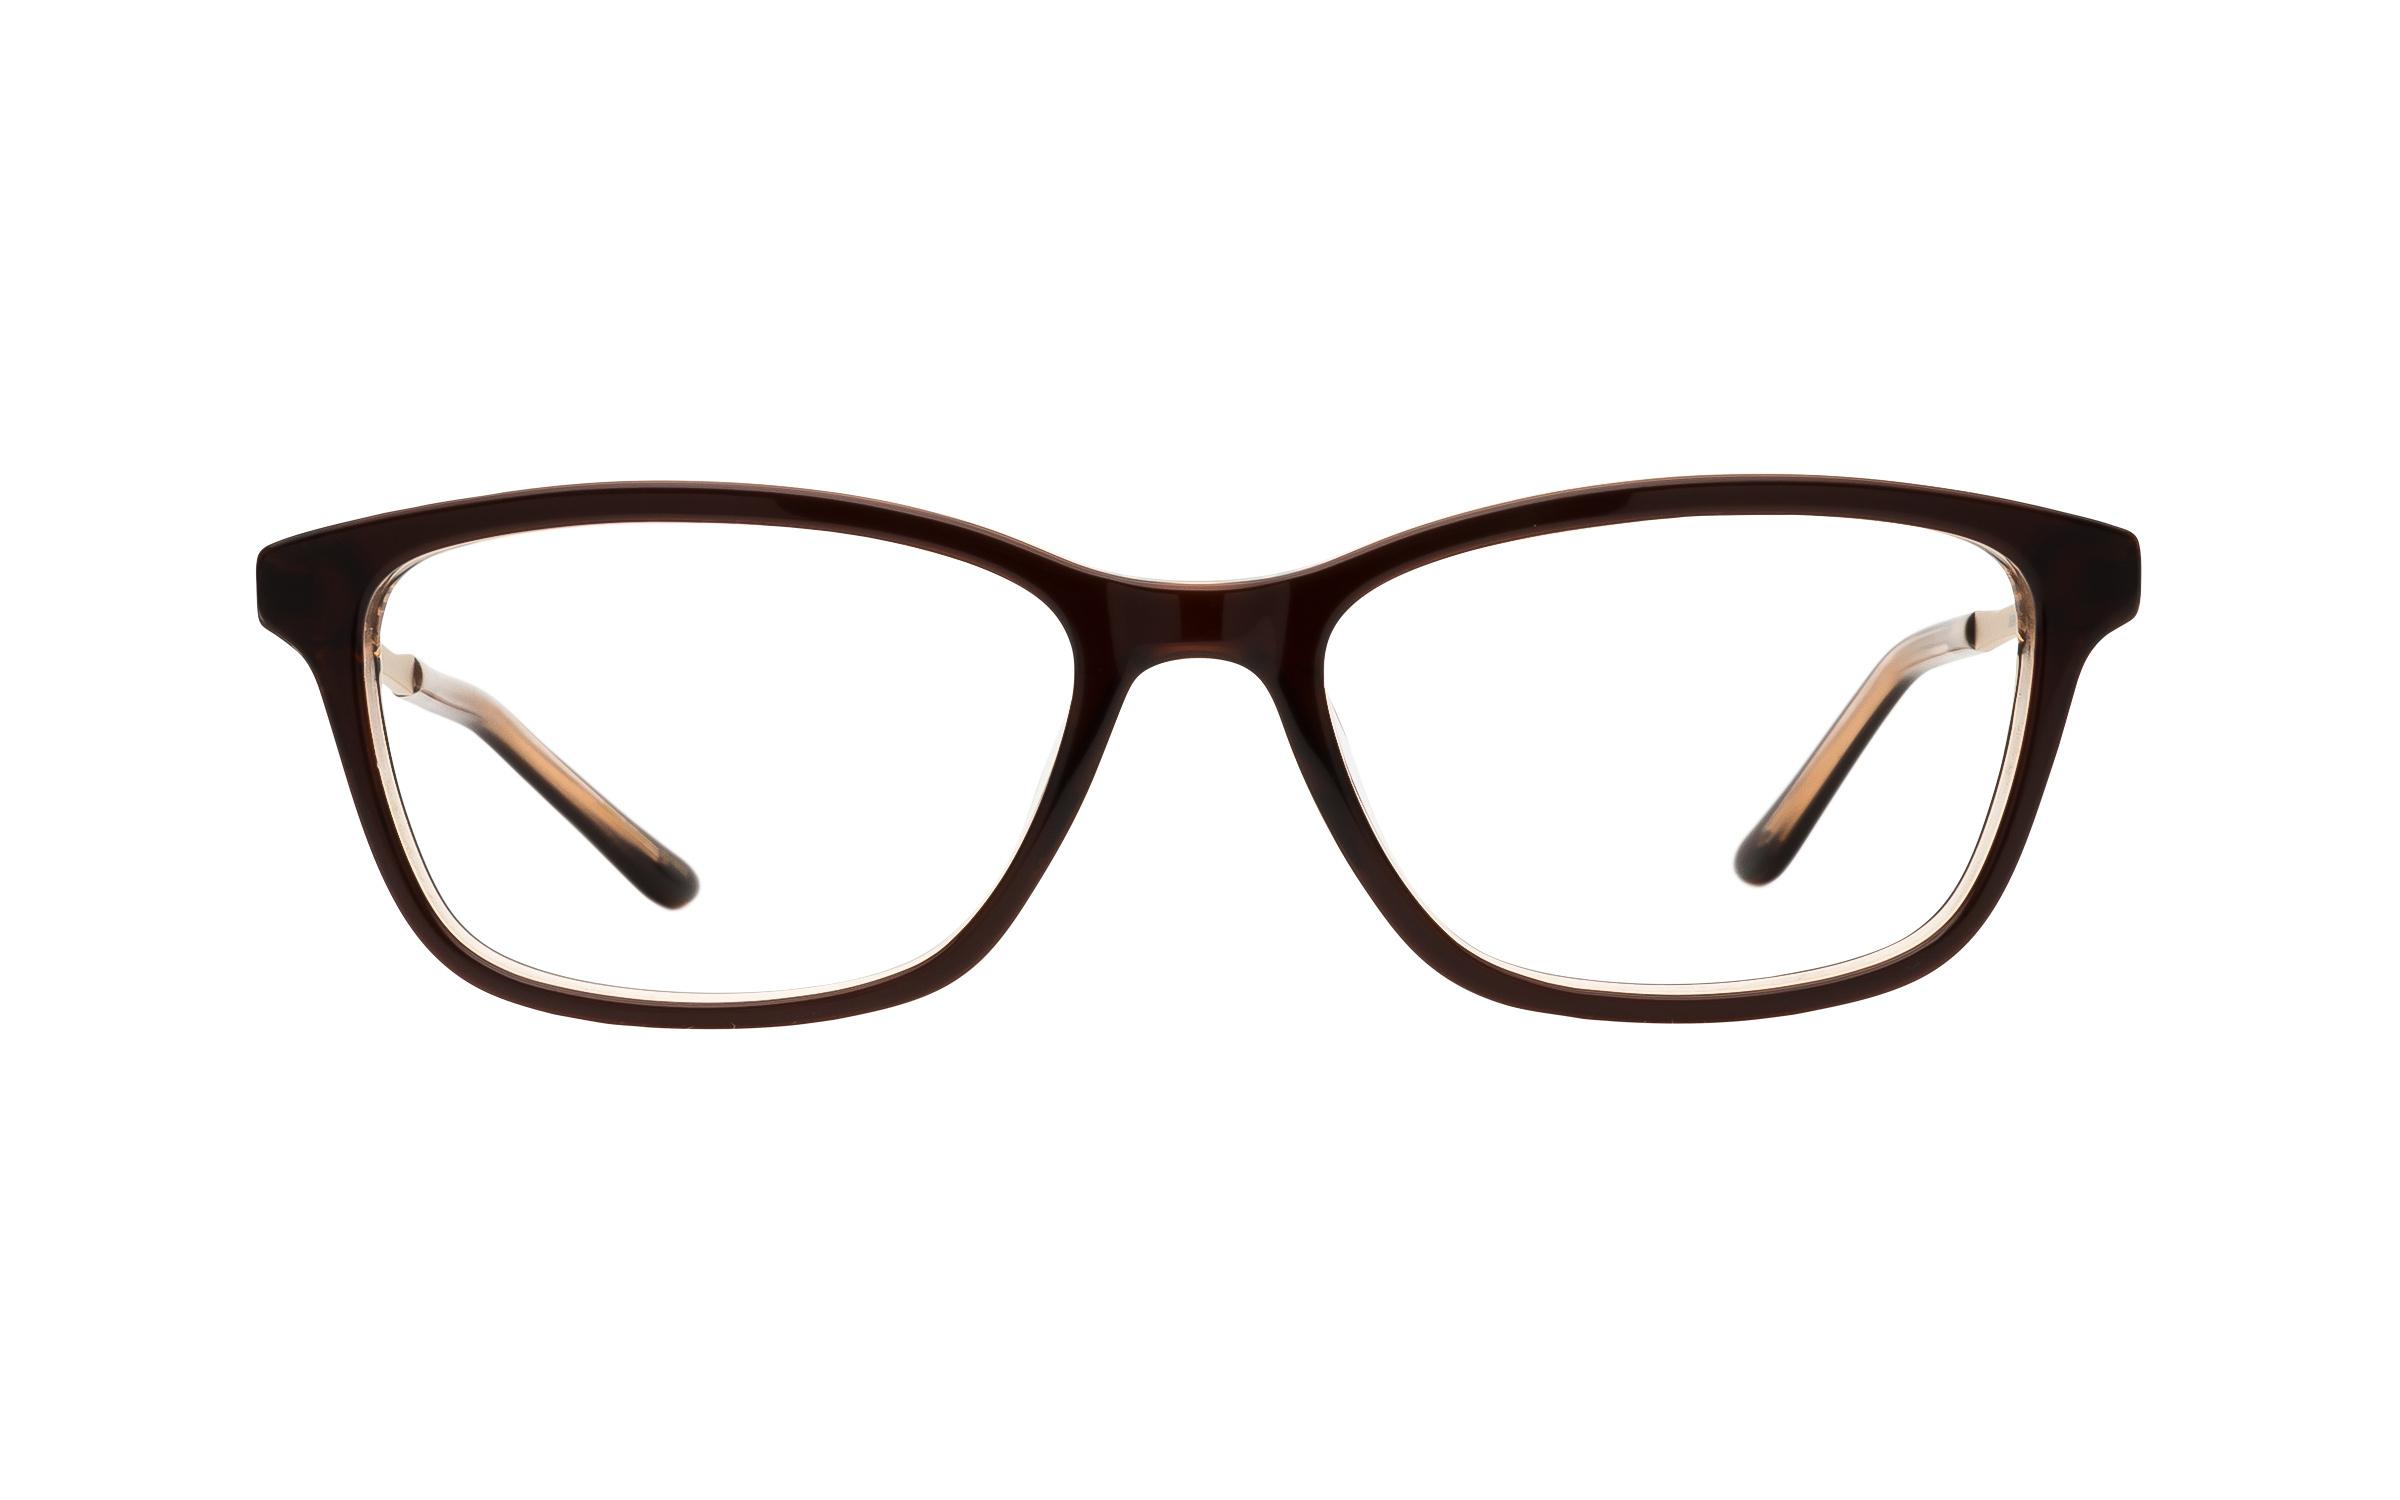 Kam Dhillon Women's Glasses Rectangular Brown Plastic/Metal Online Coastal